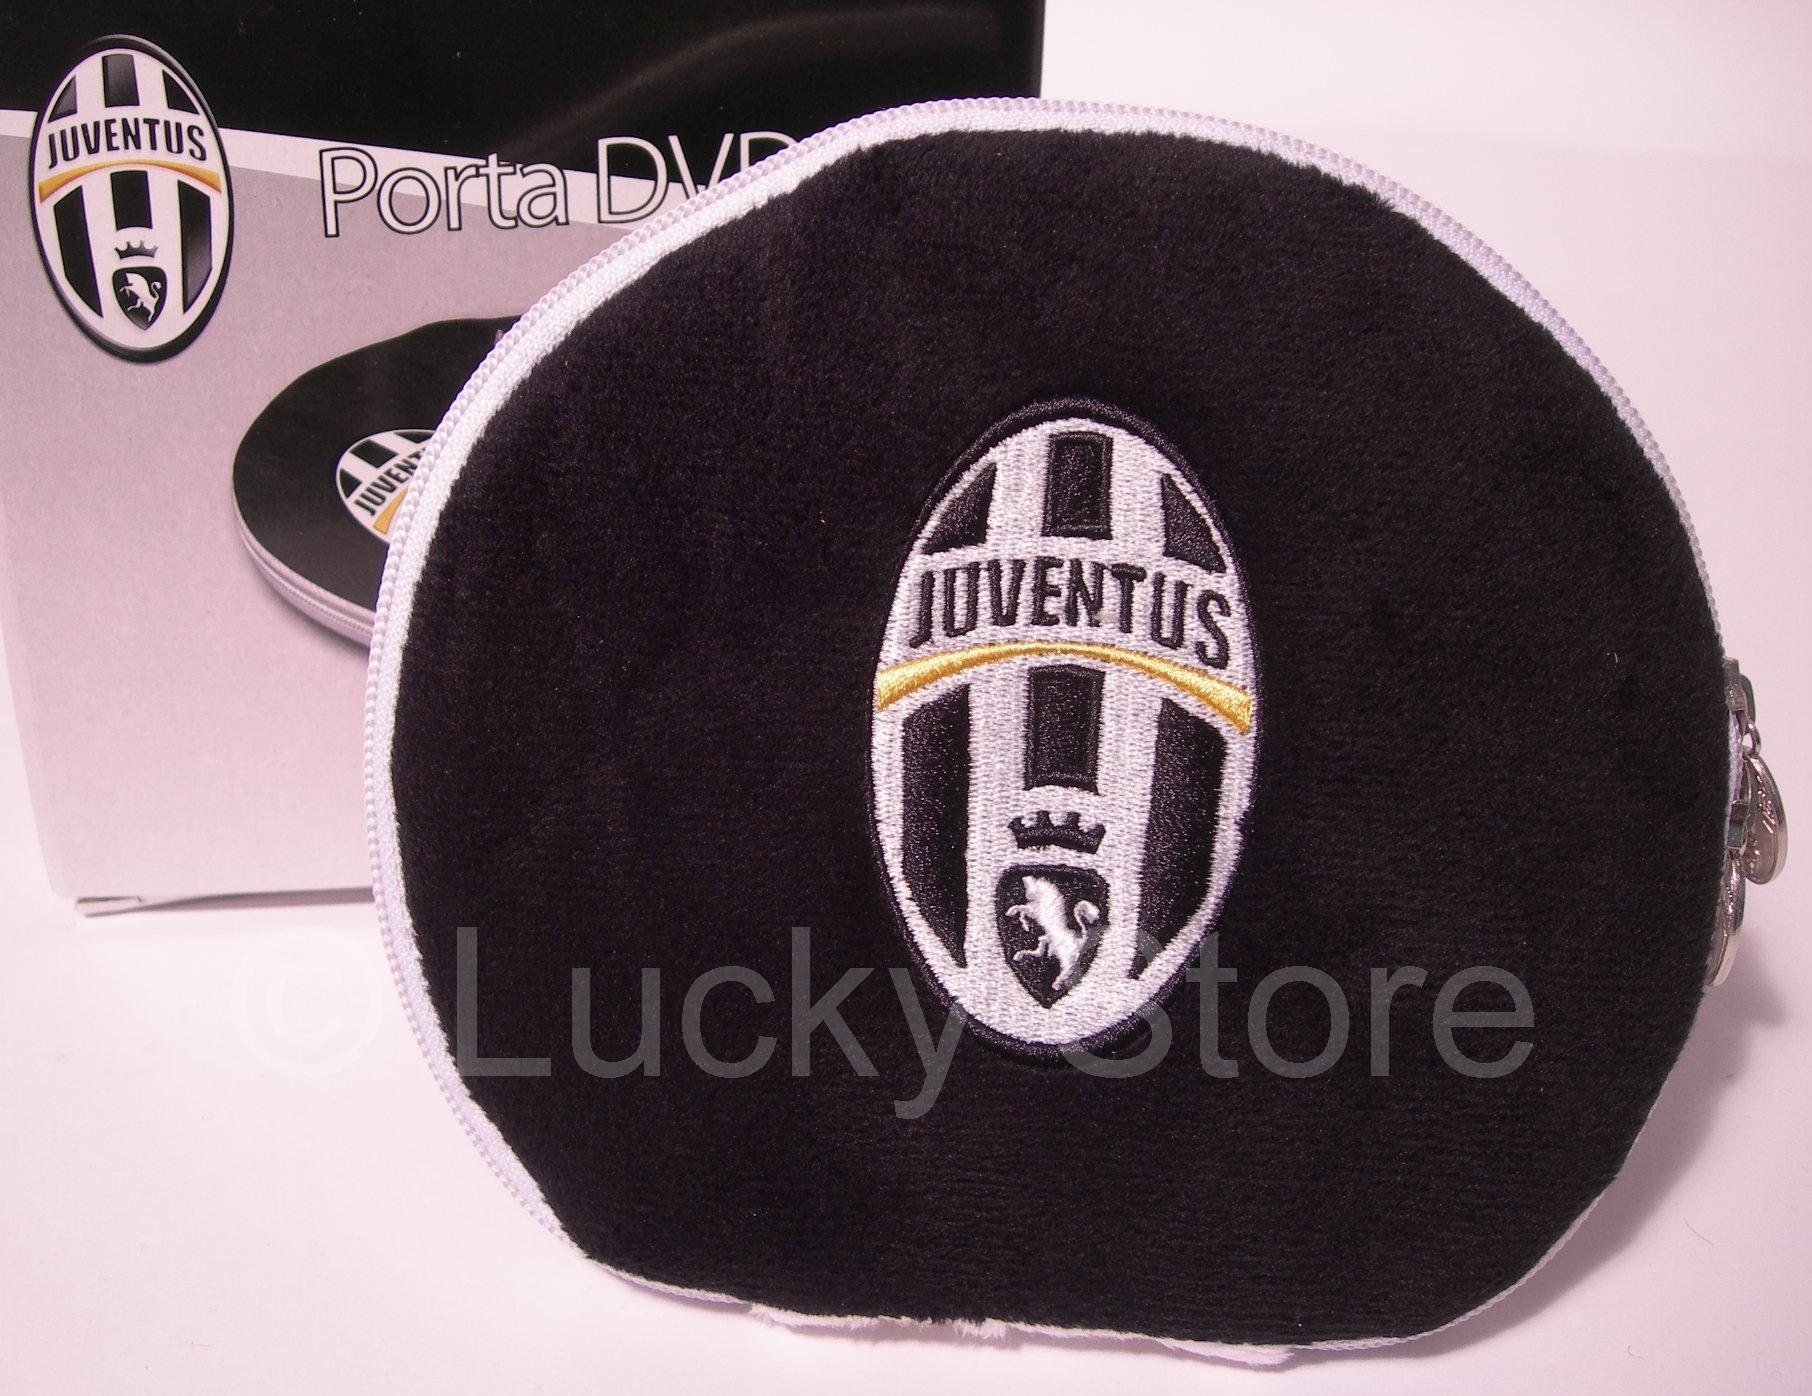 Juventus porta cd dvd ufficiale lucky store